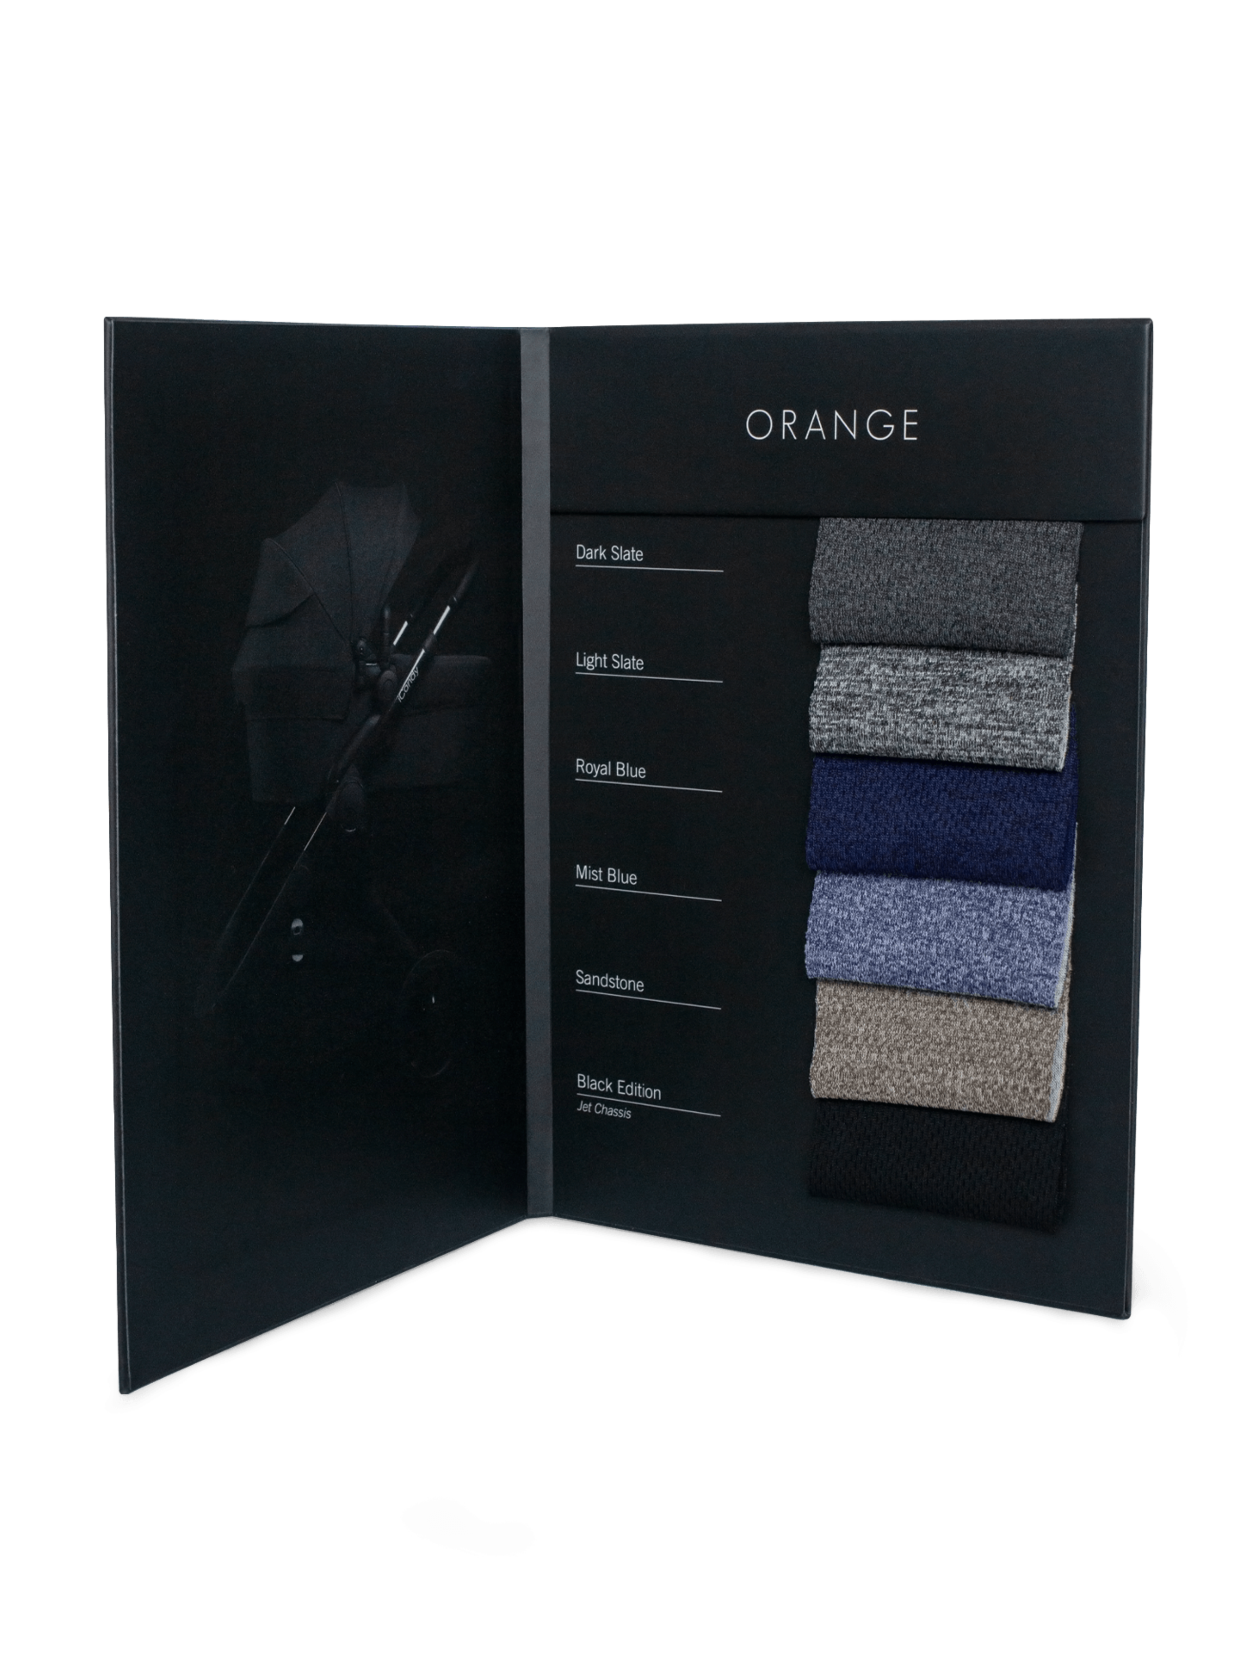 Orange Fabric Swatch